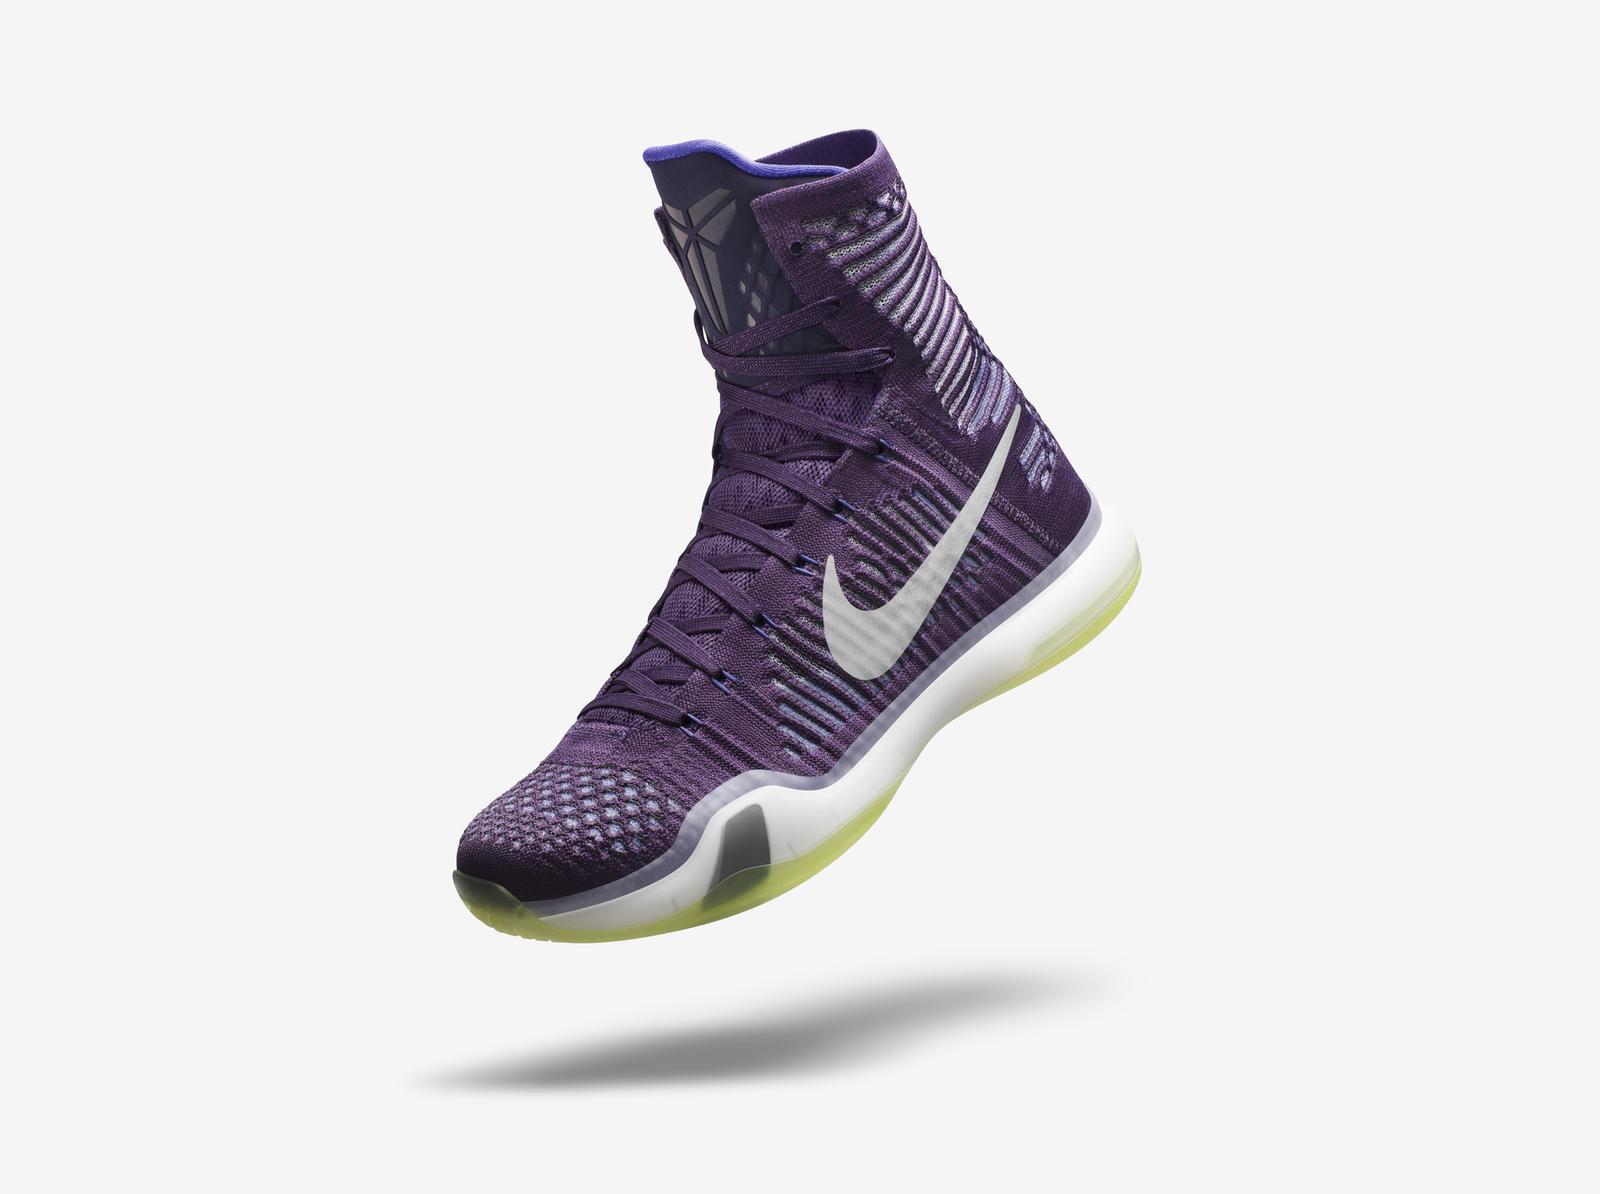 ... Nike Basketball Elite Series Team Collection: KD7, KOBE X and LEBRON .